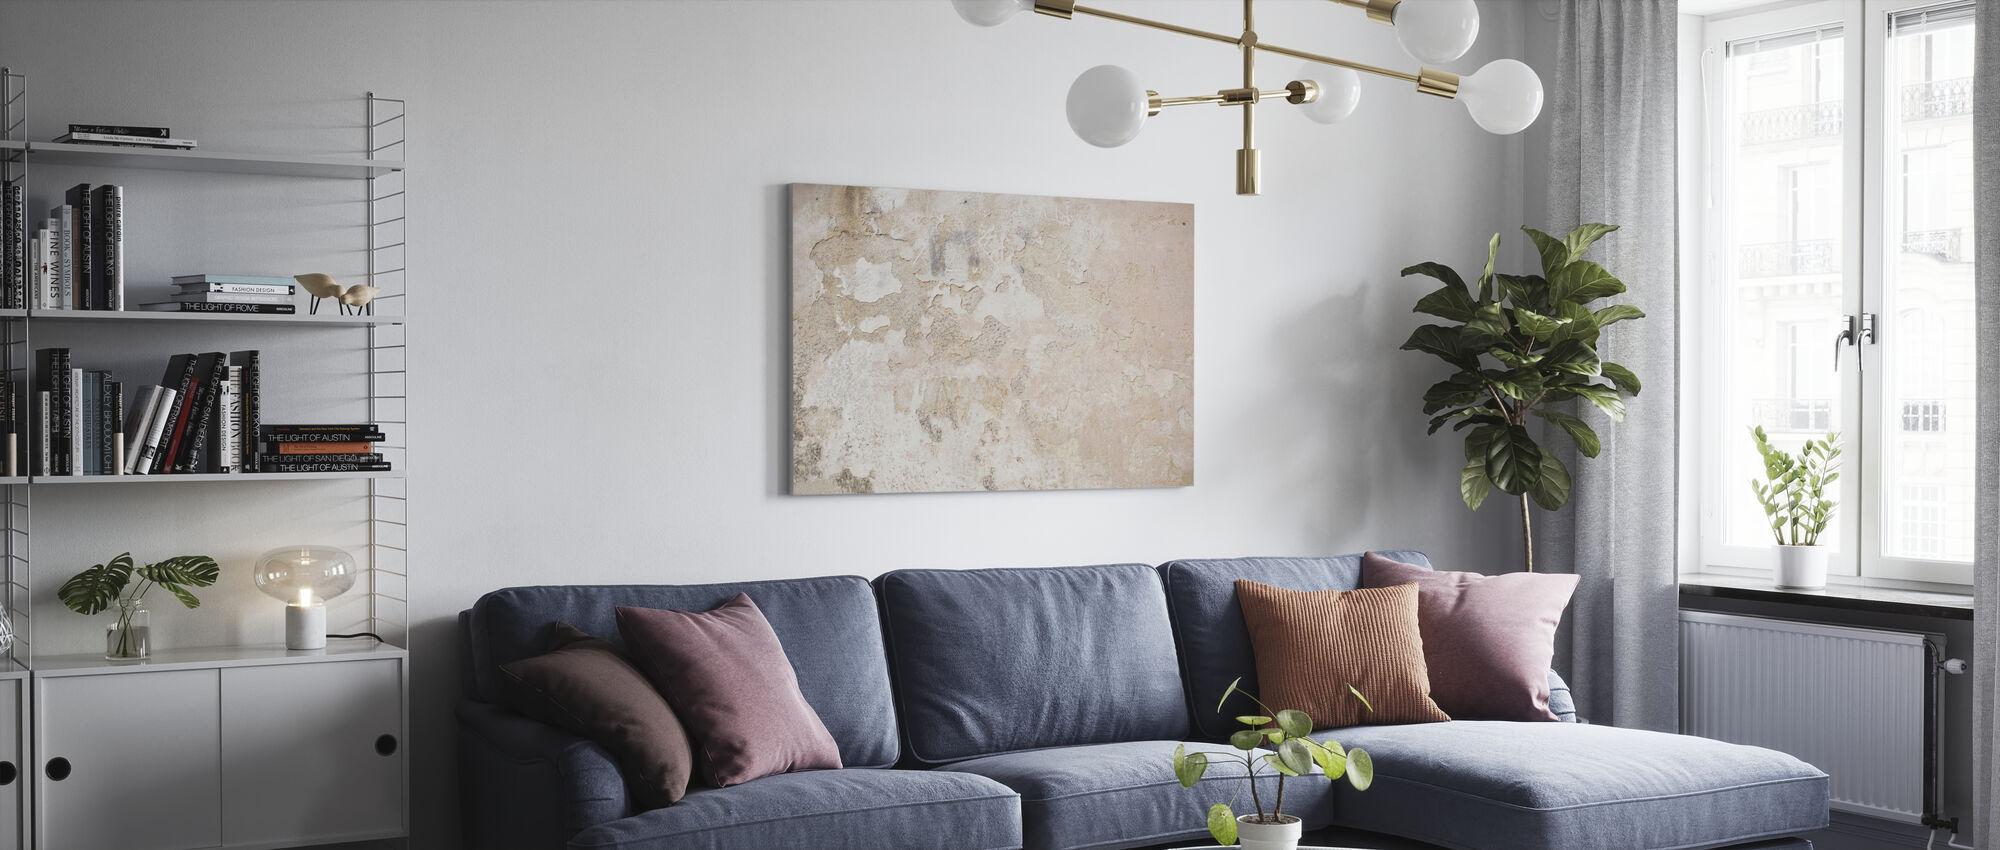 Light Street Wall - Canvas print - Living Room